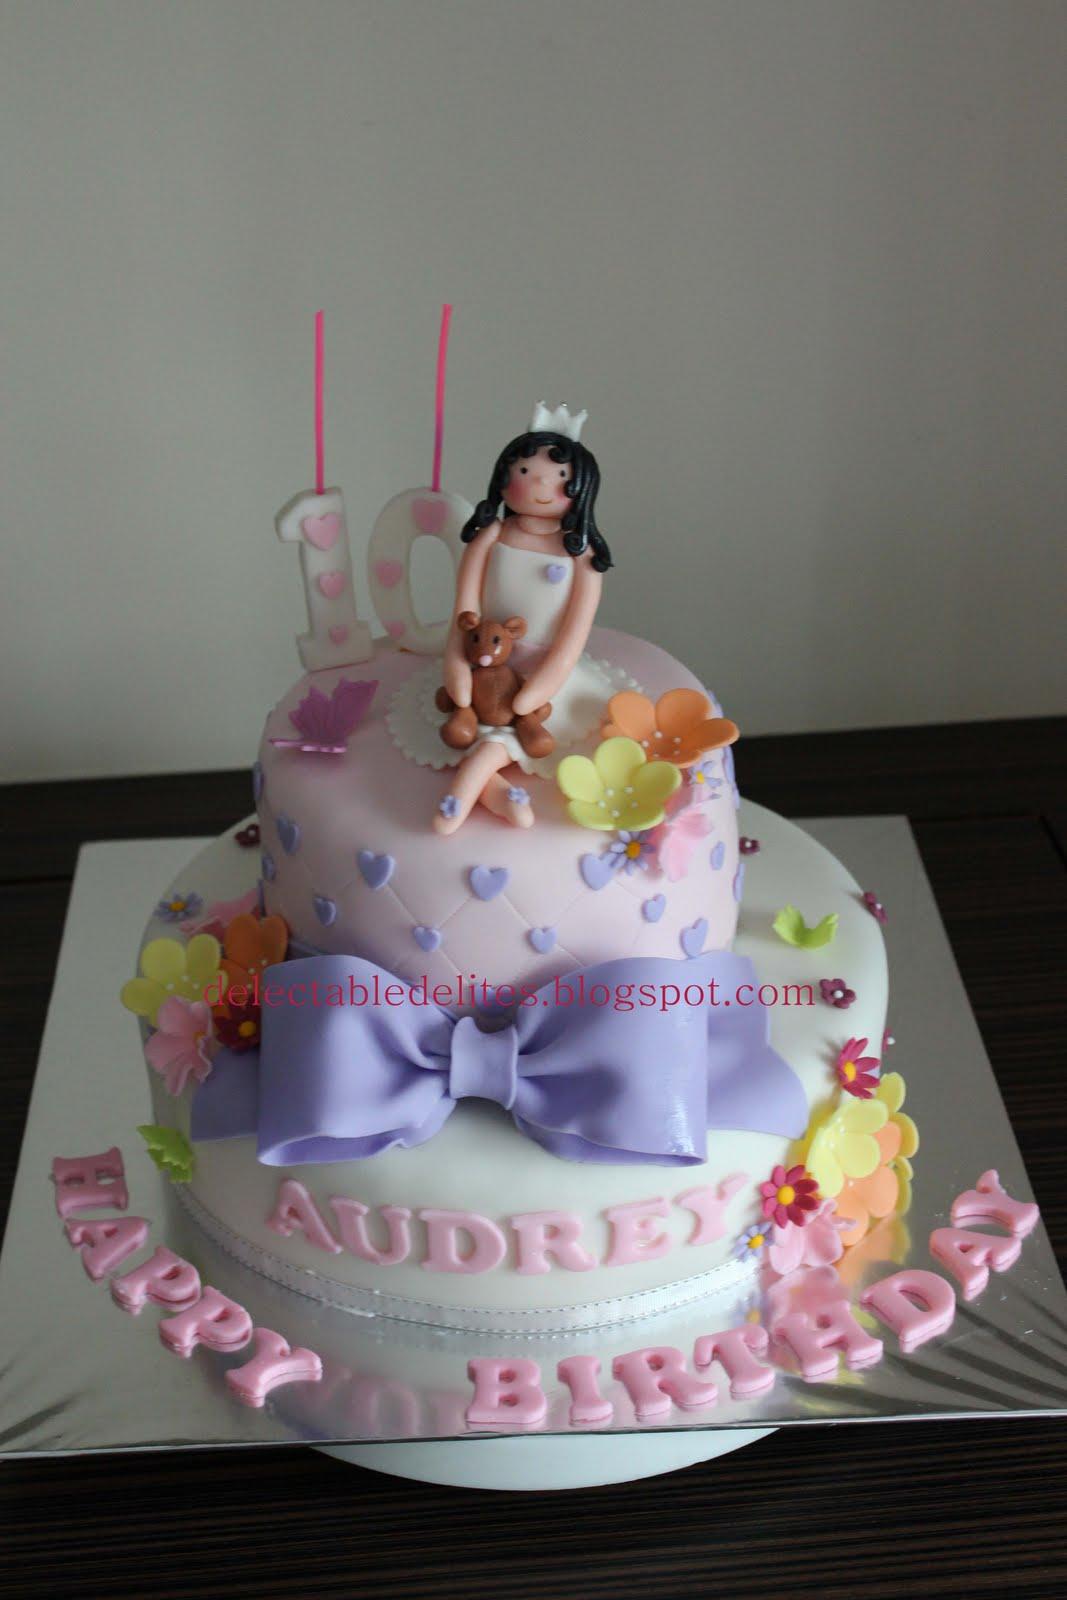 Delectable Delites: Princess theme cake